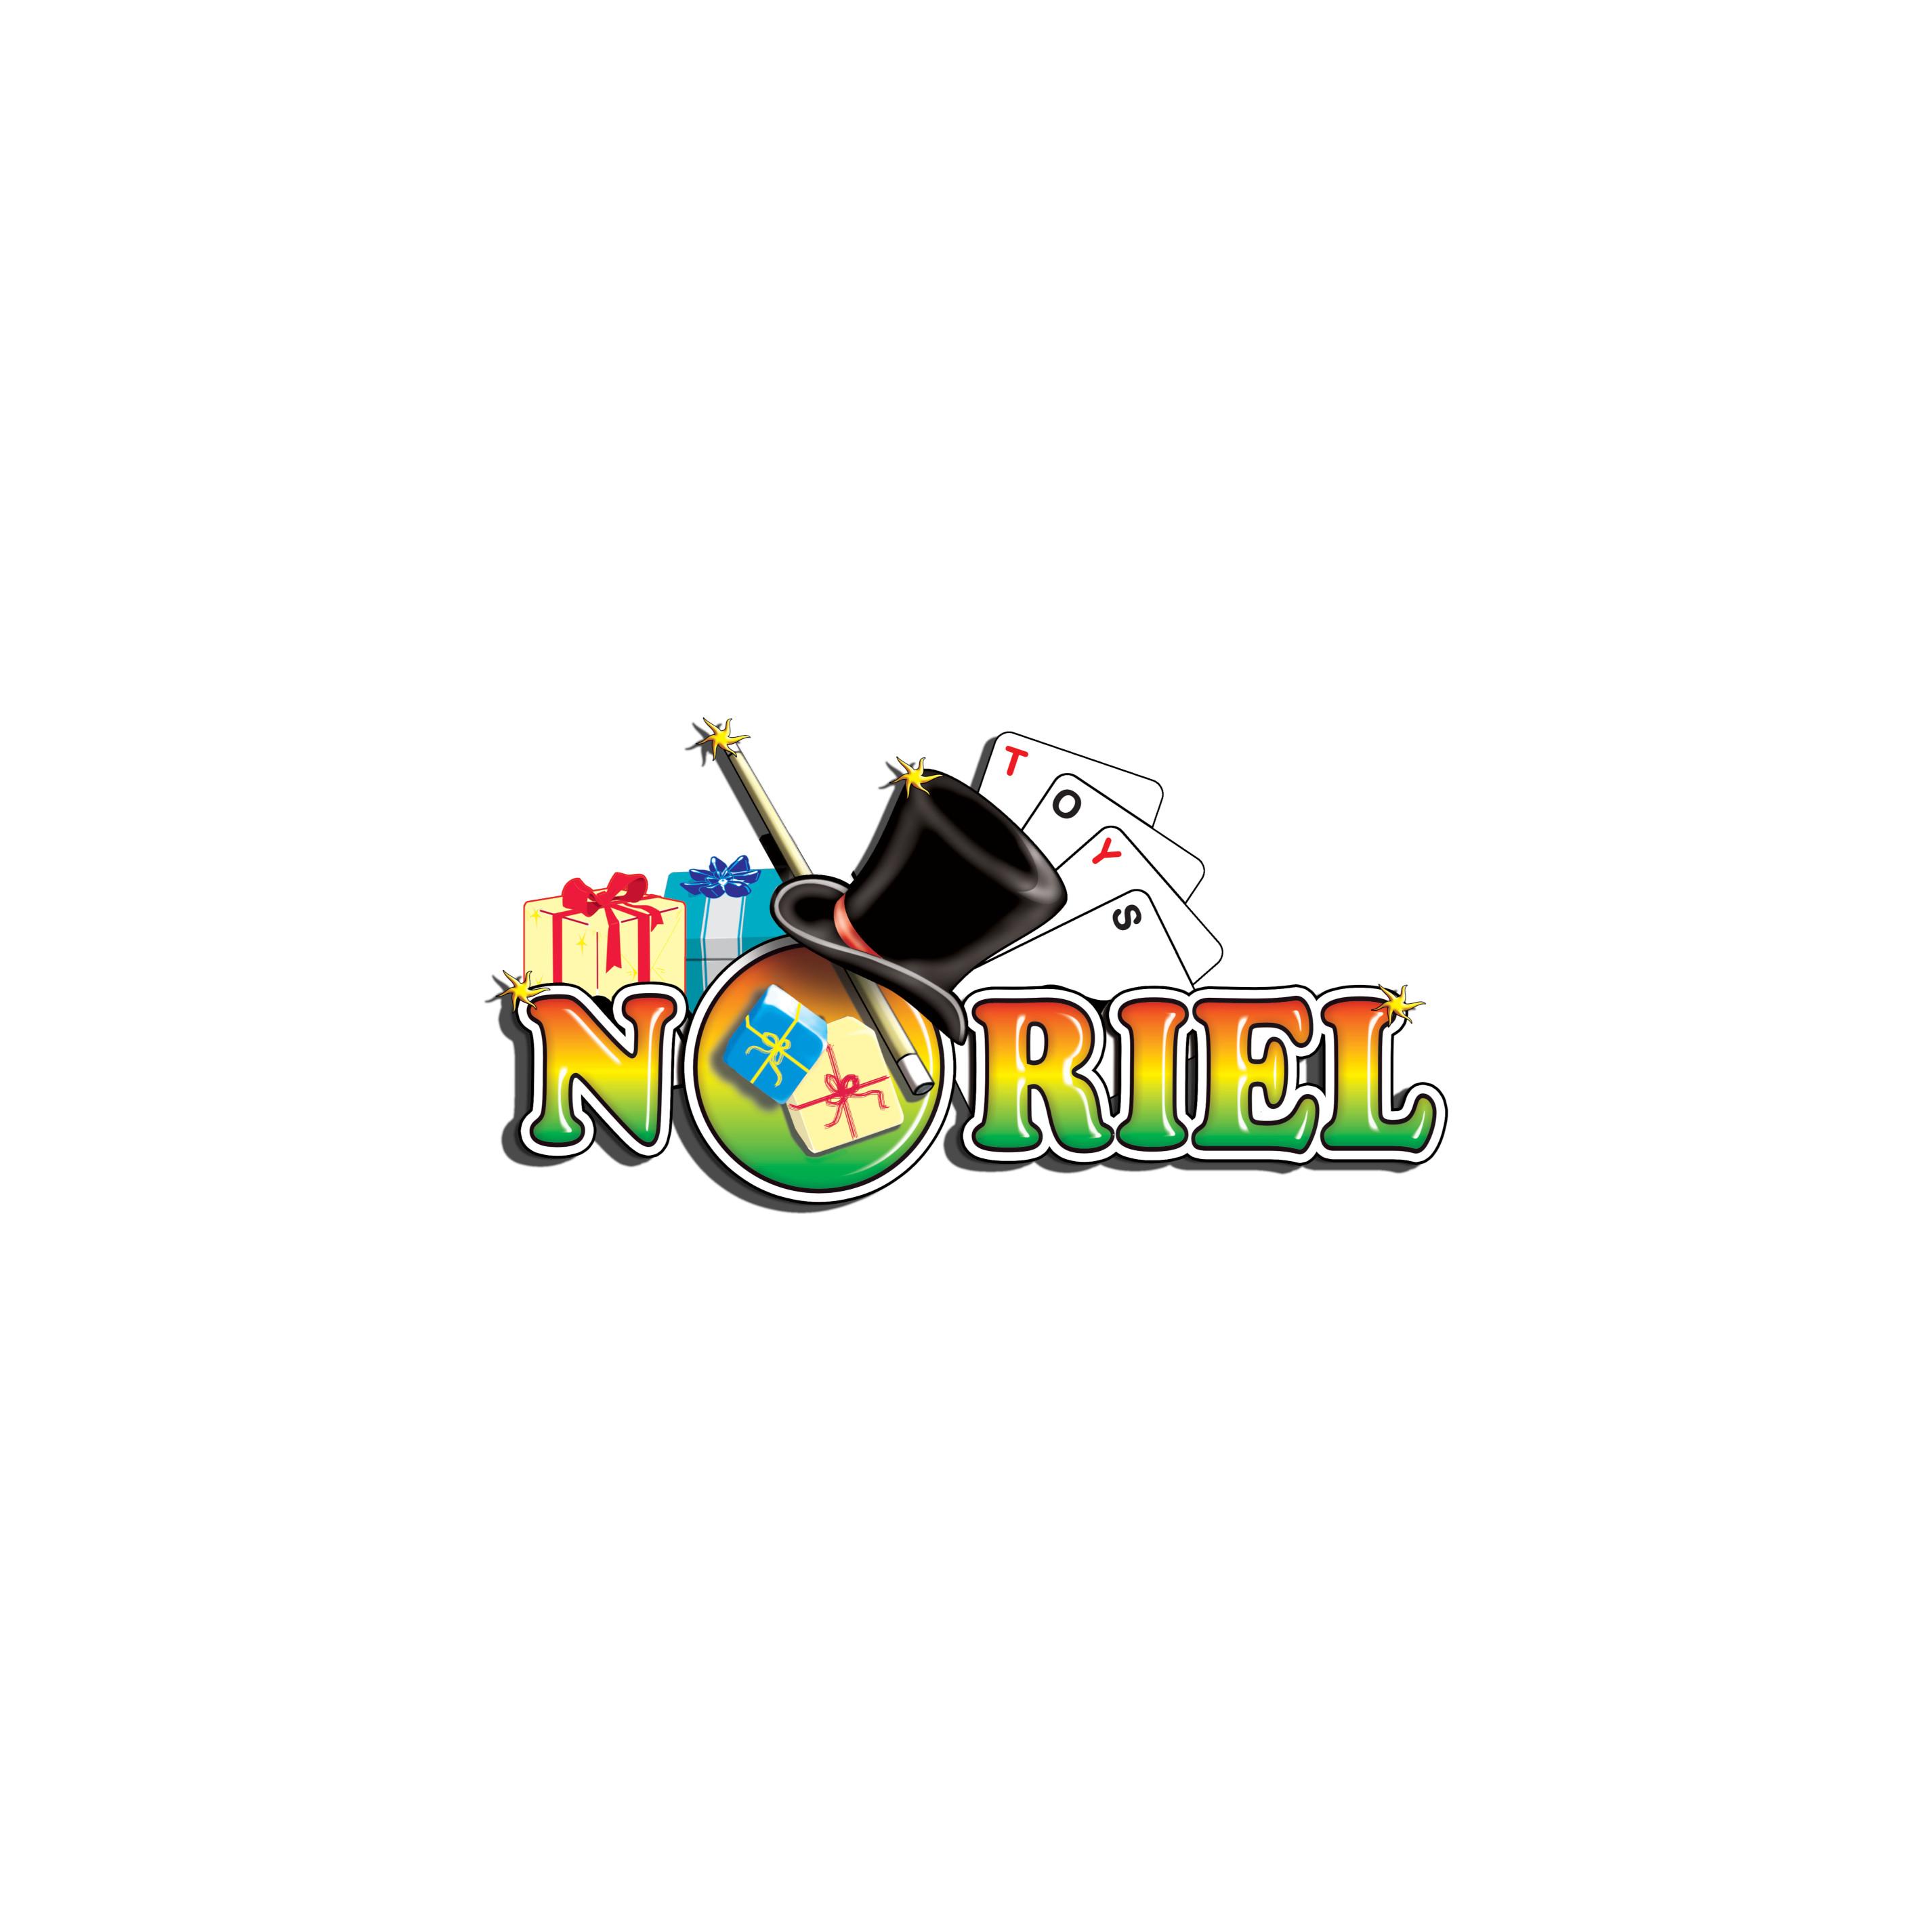 Minge Nickelodeon Grass Hydro Slime SLM-3295